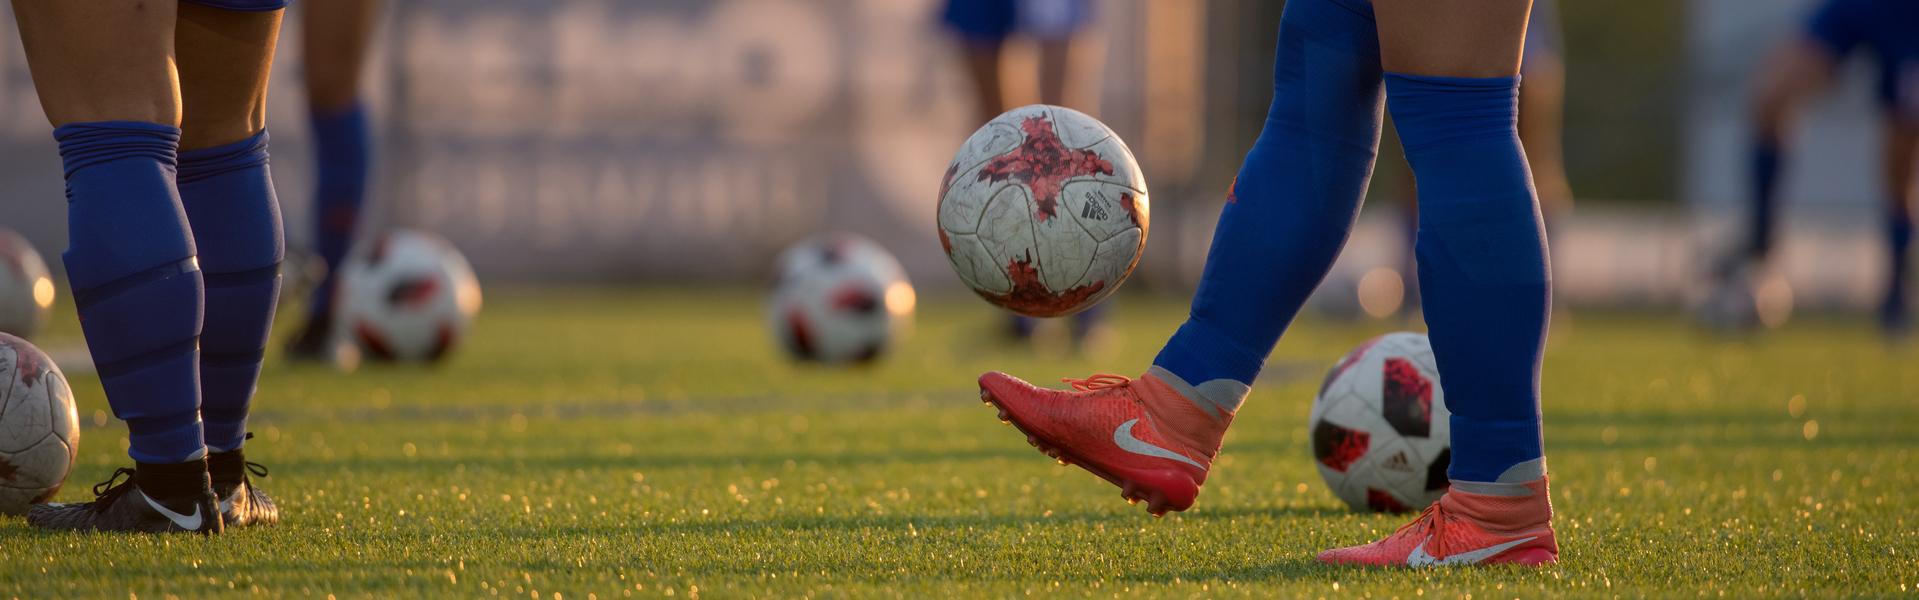 Ridgebacks soccer player